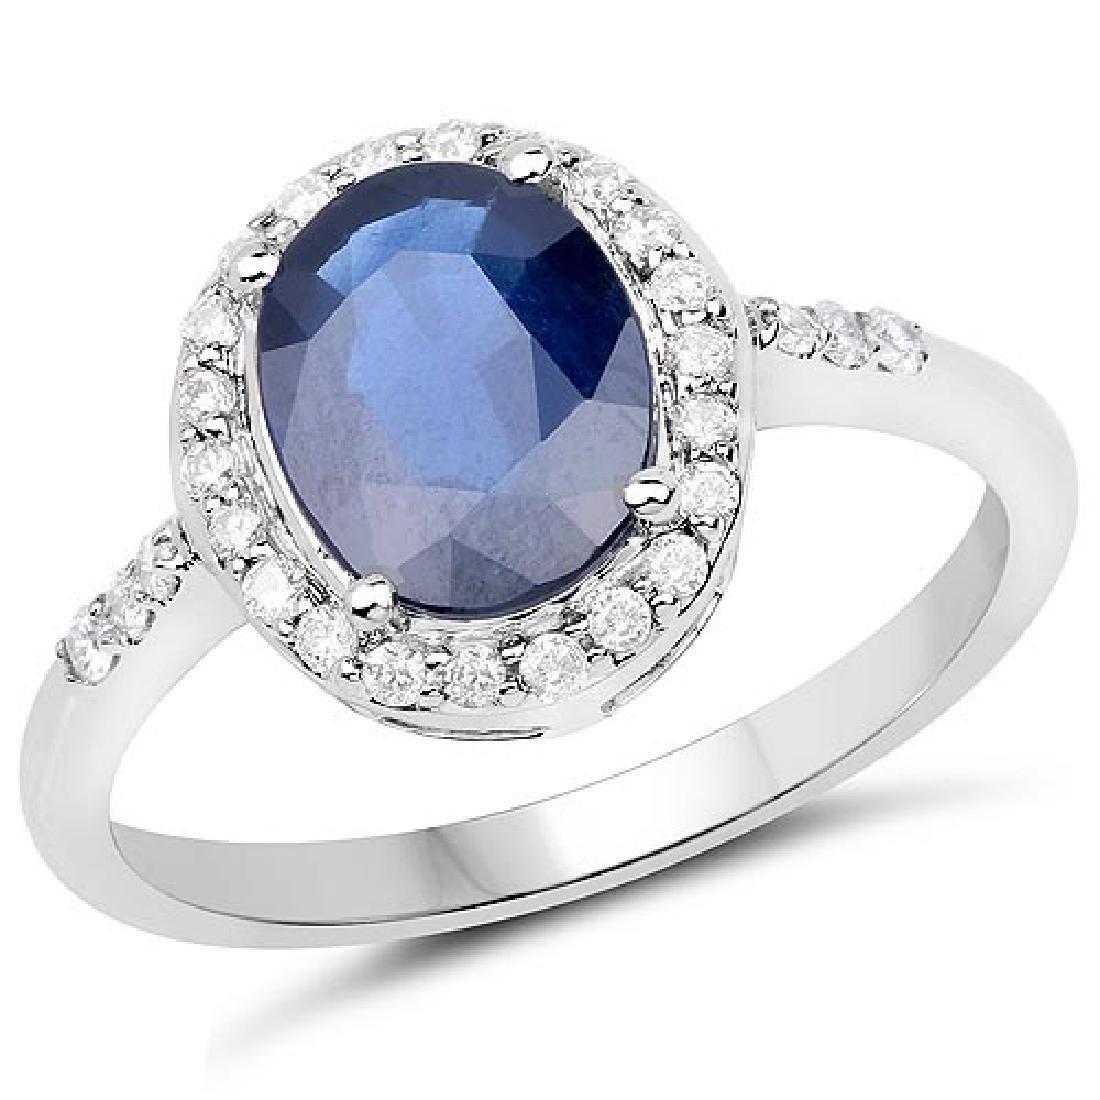 2.46 Carat Genuine Blue Sapphire and White Diamond 14K